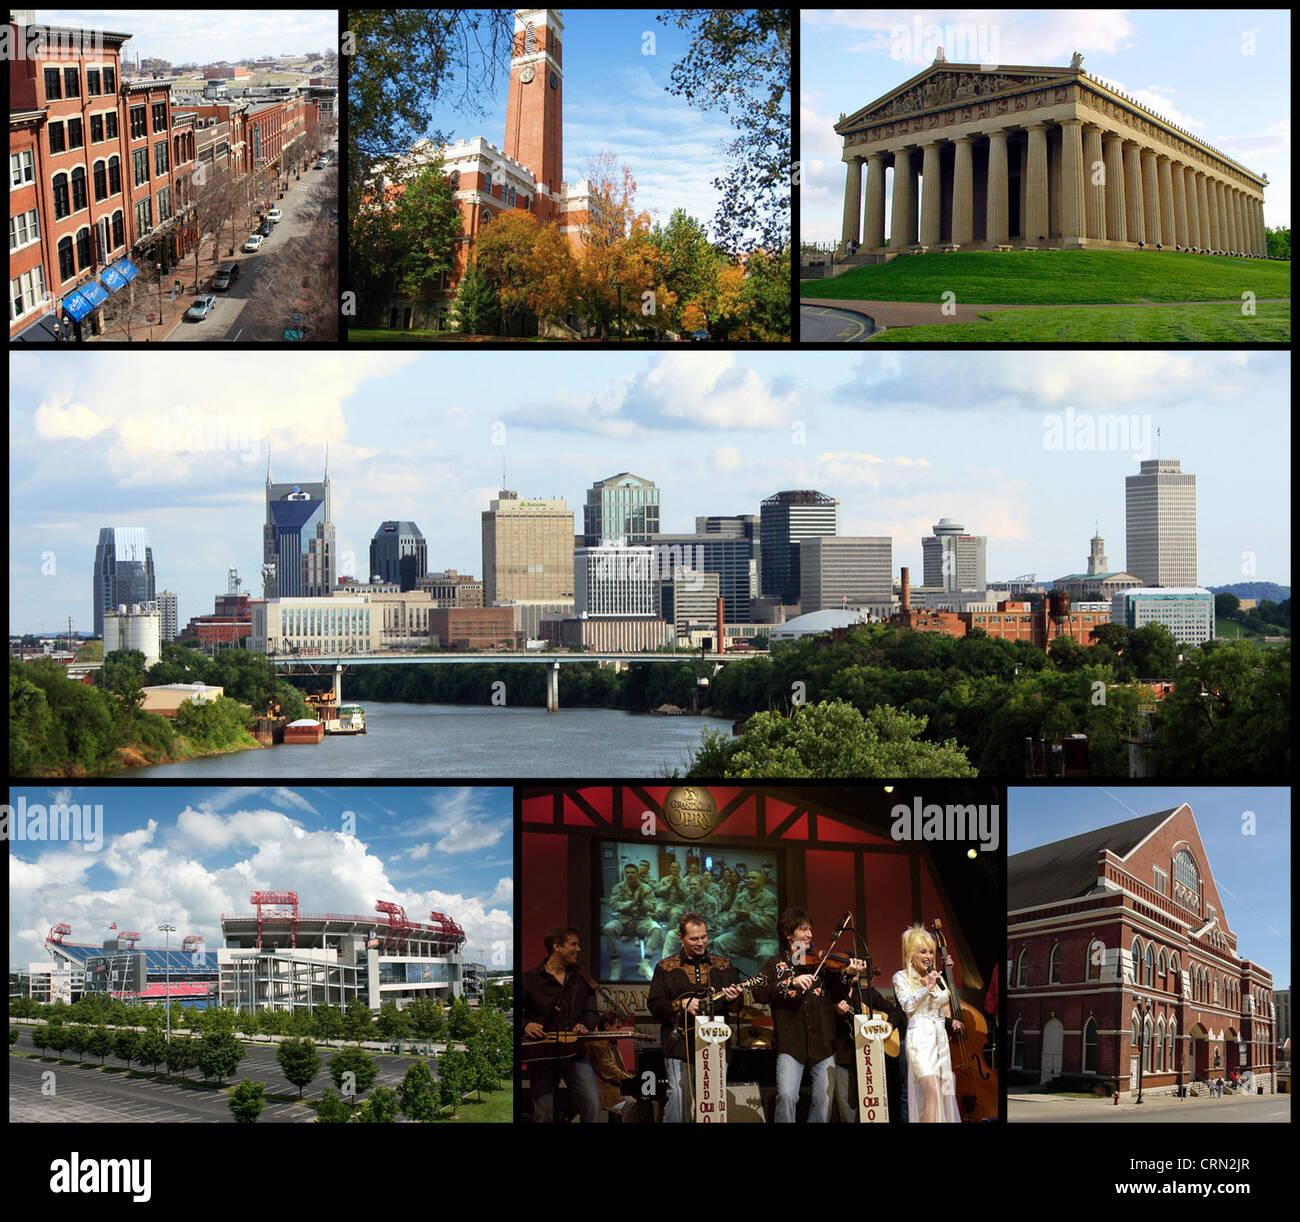 Collage of Nashville landmarks. Top row: 2nd Avenue, Kirkland Hall (Vanderbilt University), The Parthenon; Middle - Stock Image